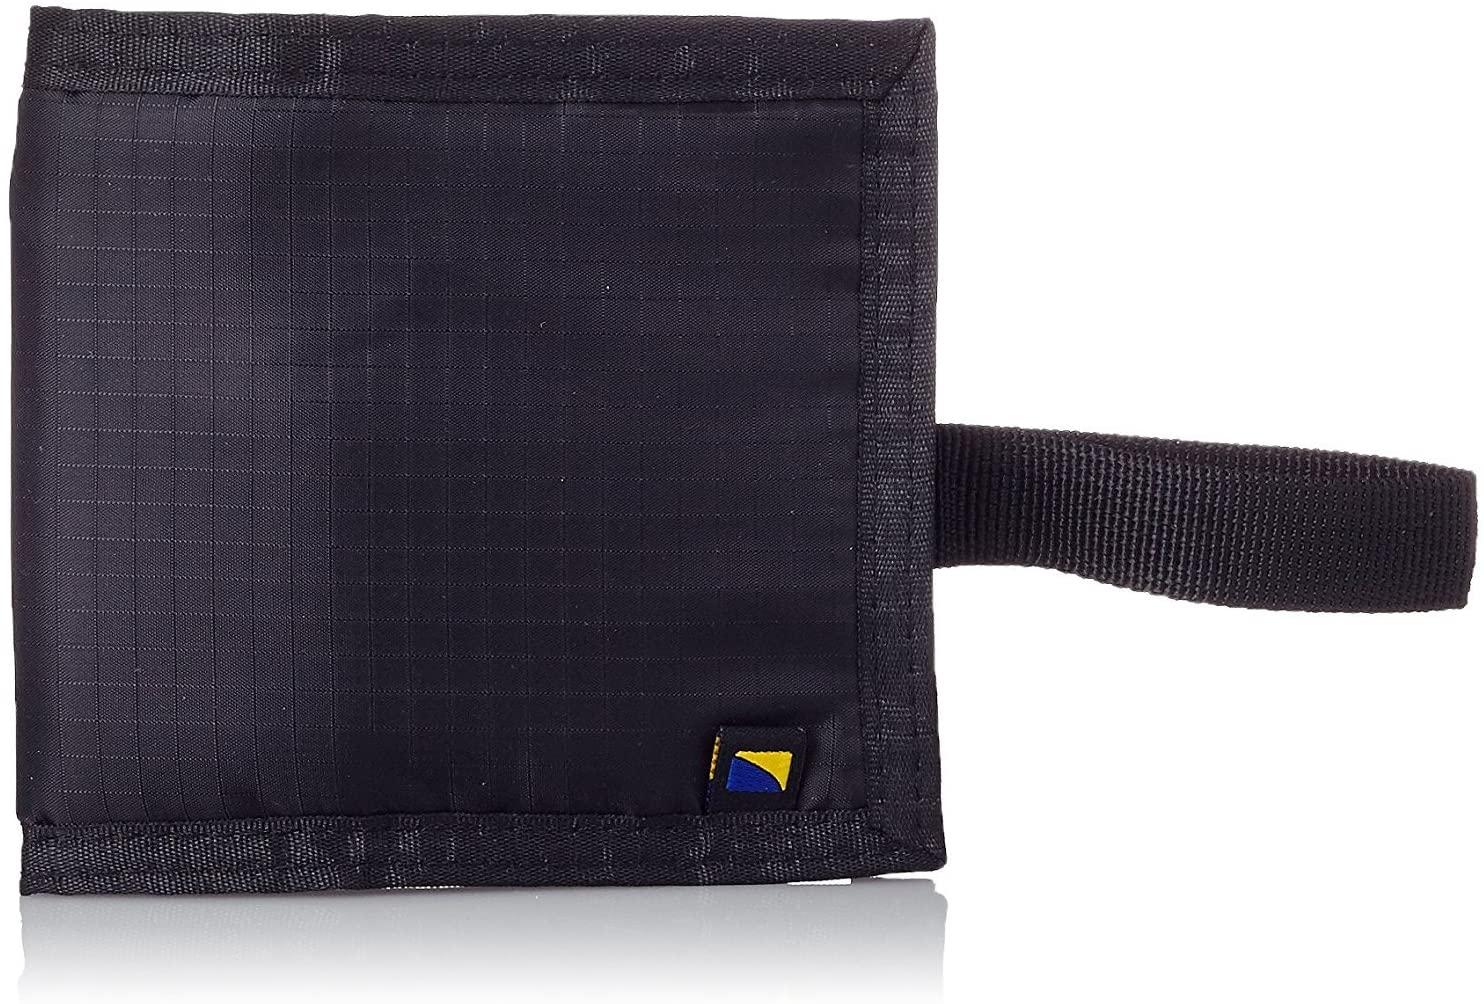 Travel Blue Anti-Theft Money Belt Loop Wallet Hidden Bi Fold, Black